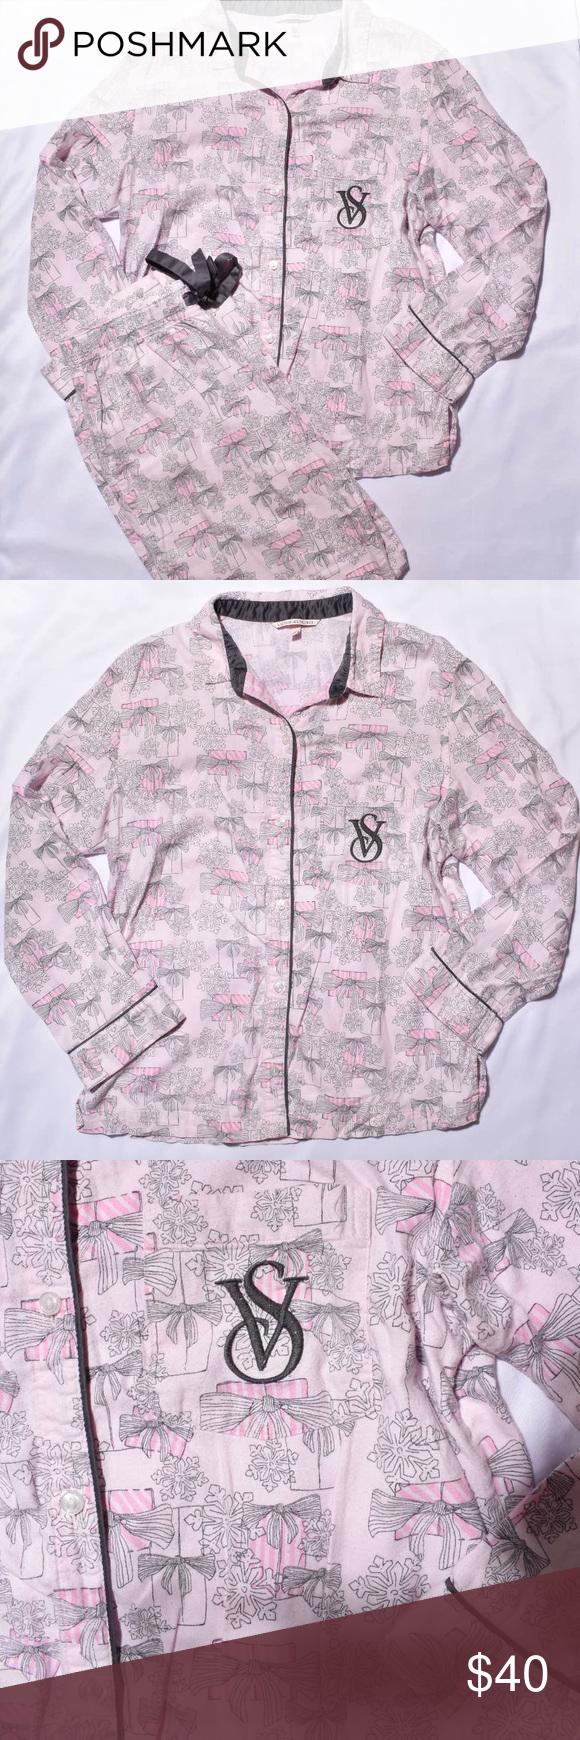 225a97f72470c Winter Pink Christmas Dreamer Flannel Pajama set | My Posh Picks ...